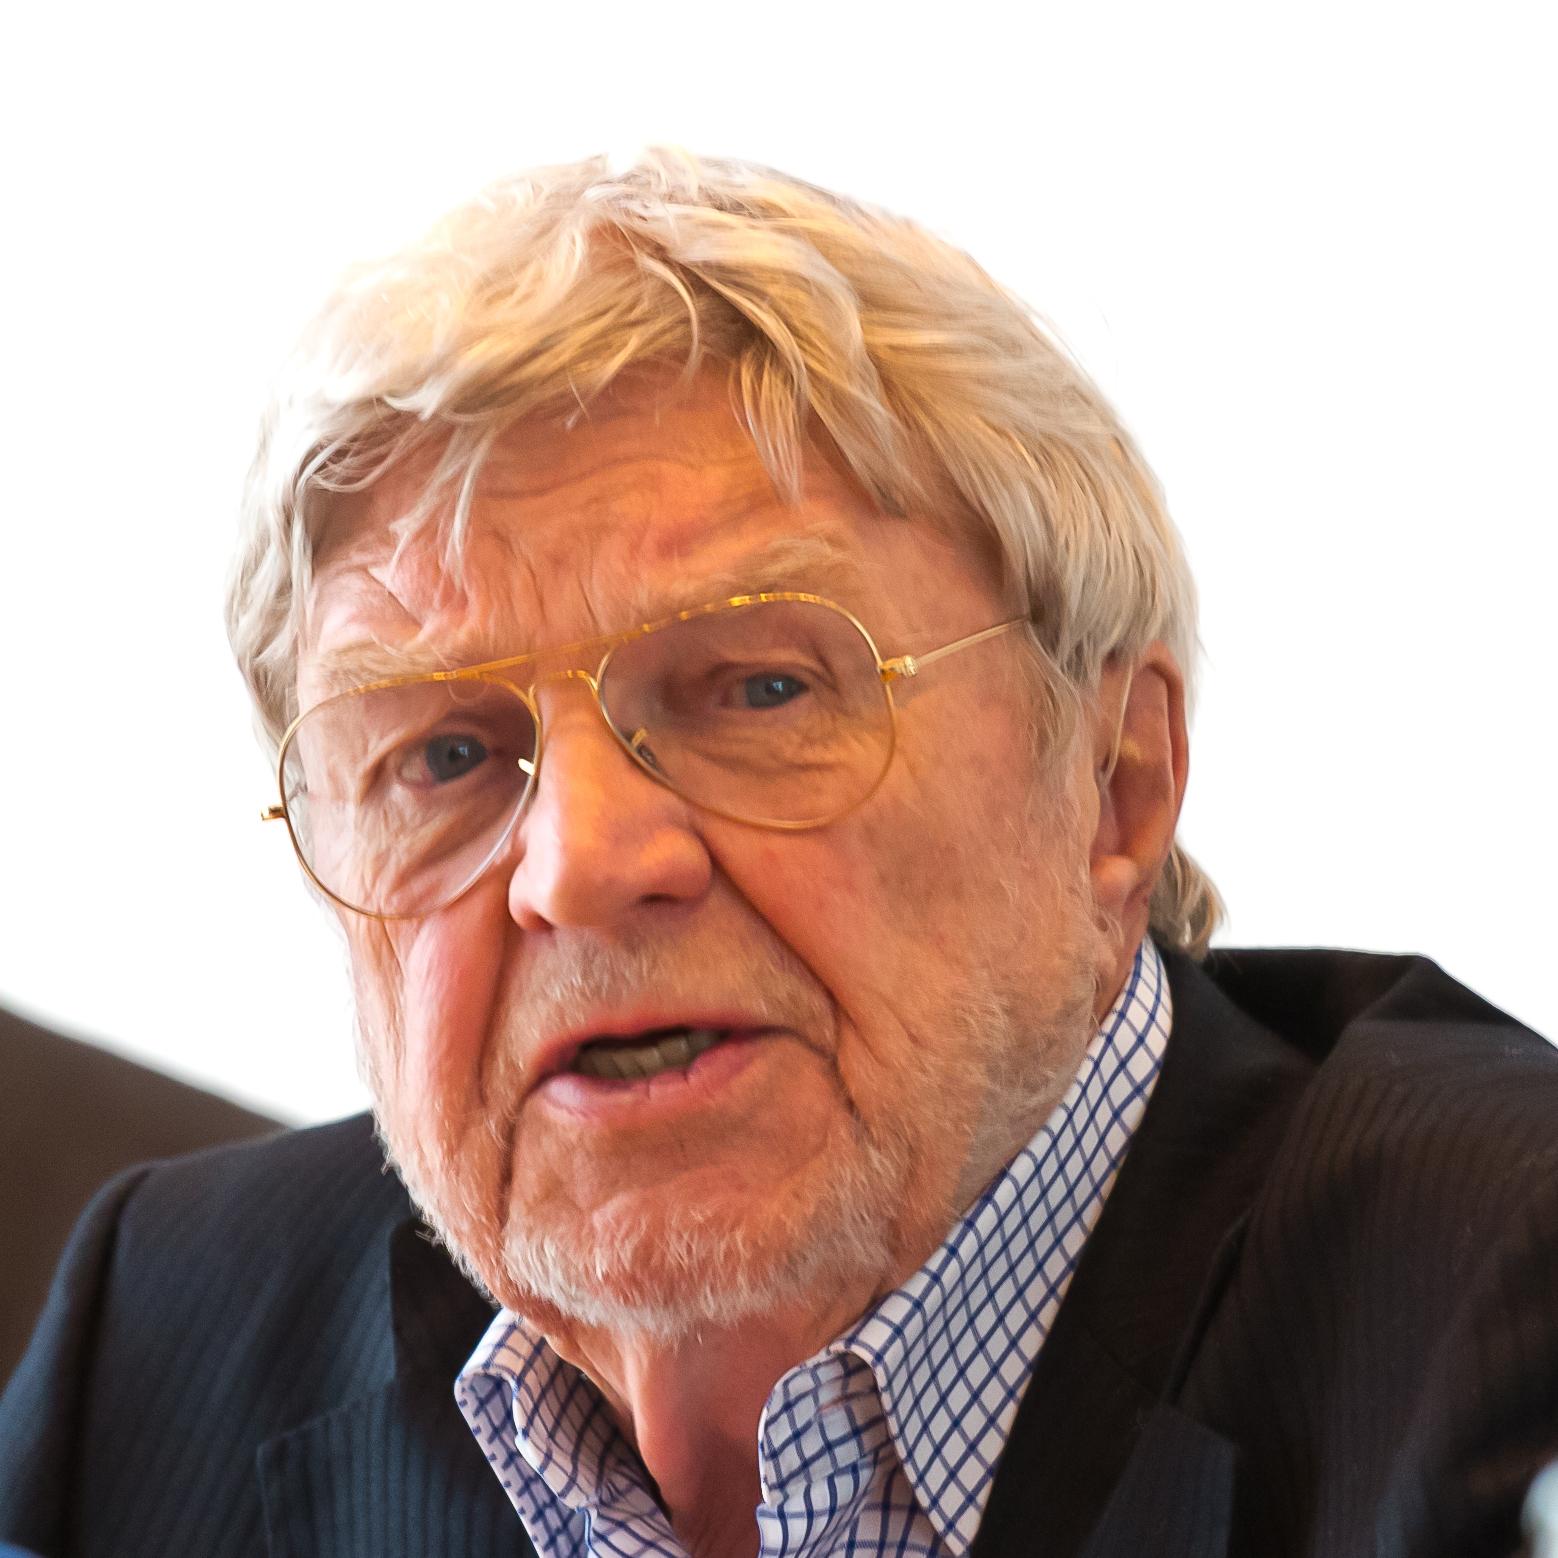 Krüger file pressekonferenz hardy krüger gemeinsam gegen rechte gewalt